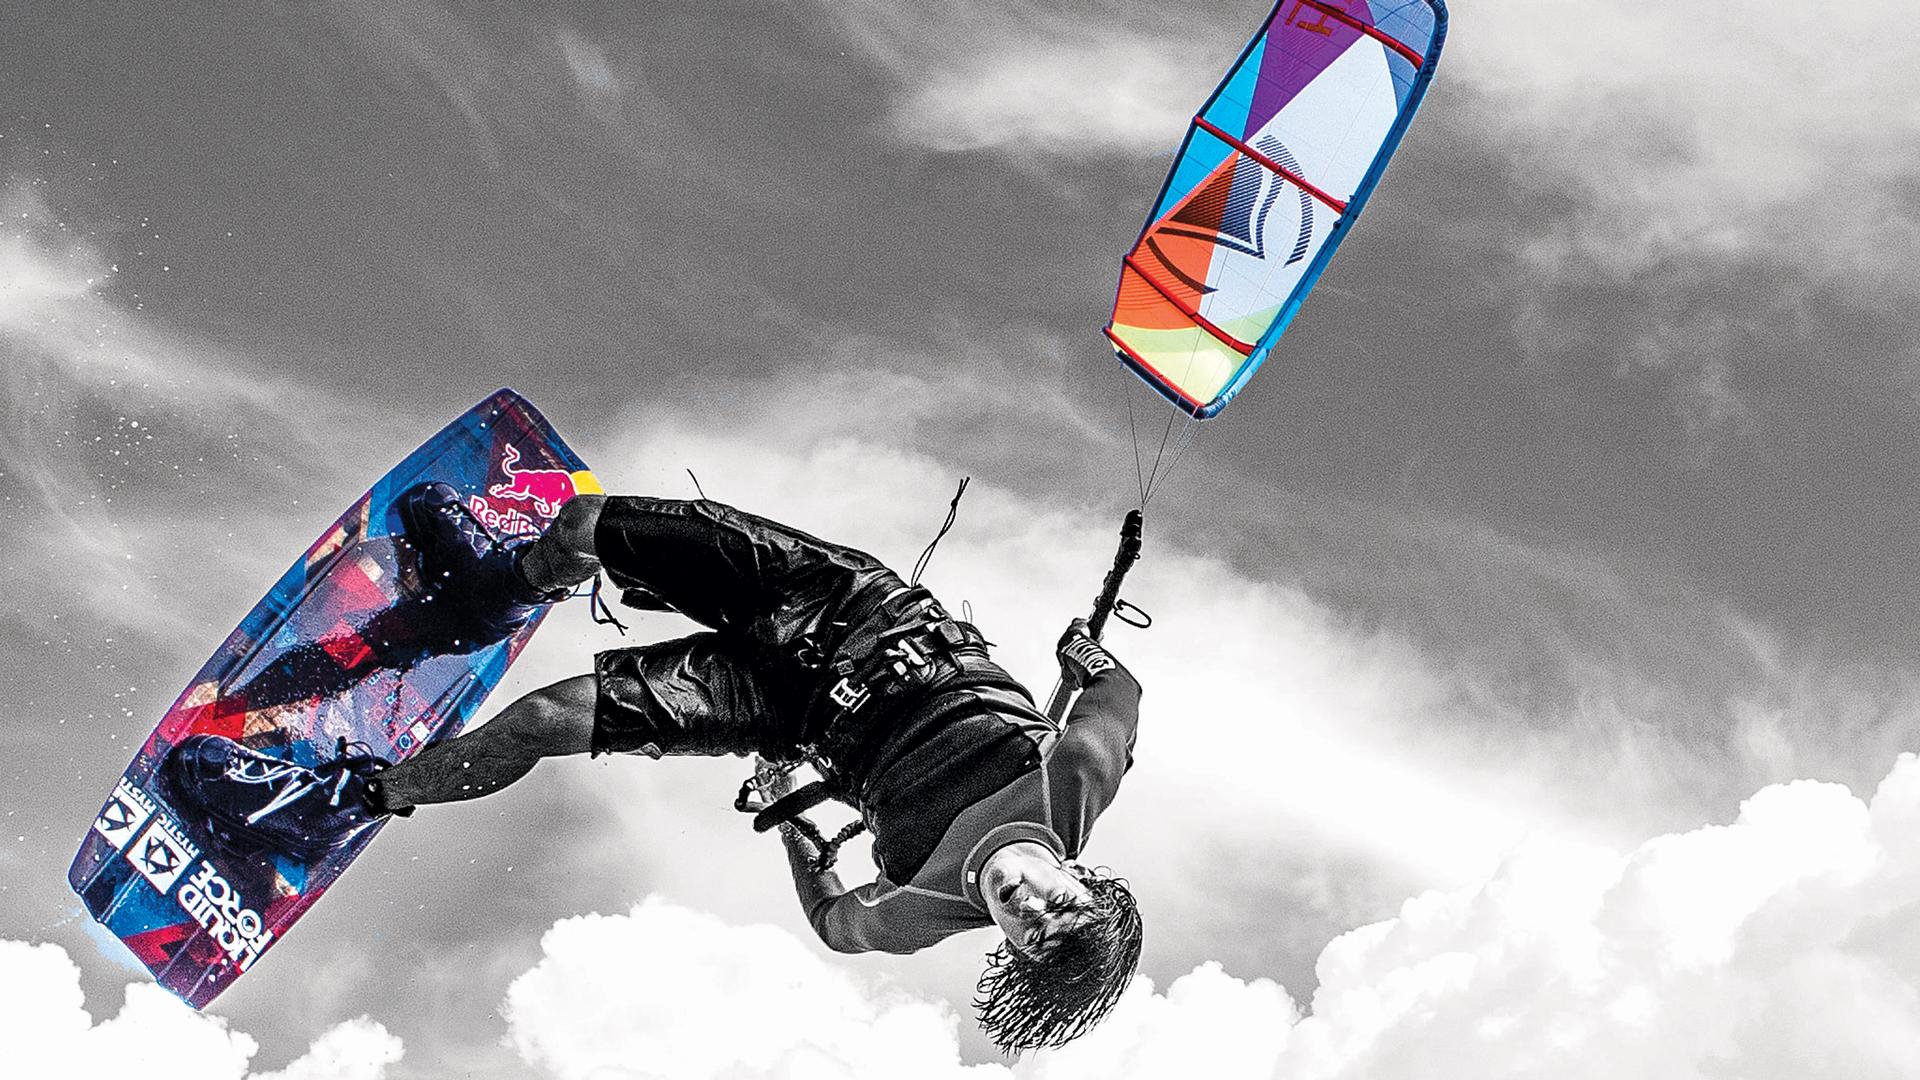 Download Wake style kiteboarding wallpaper Cristophe Tack 1920x1080